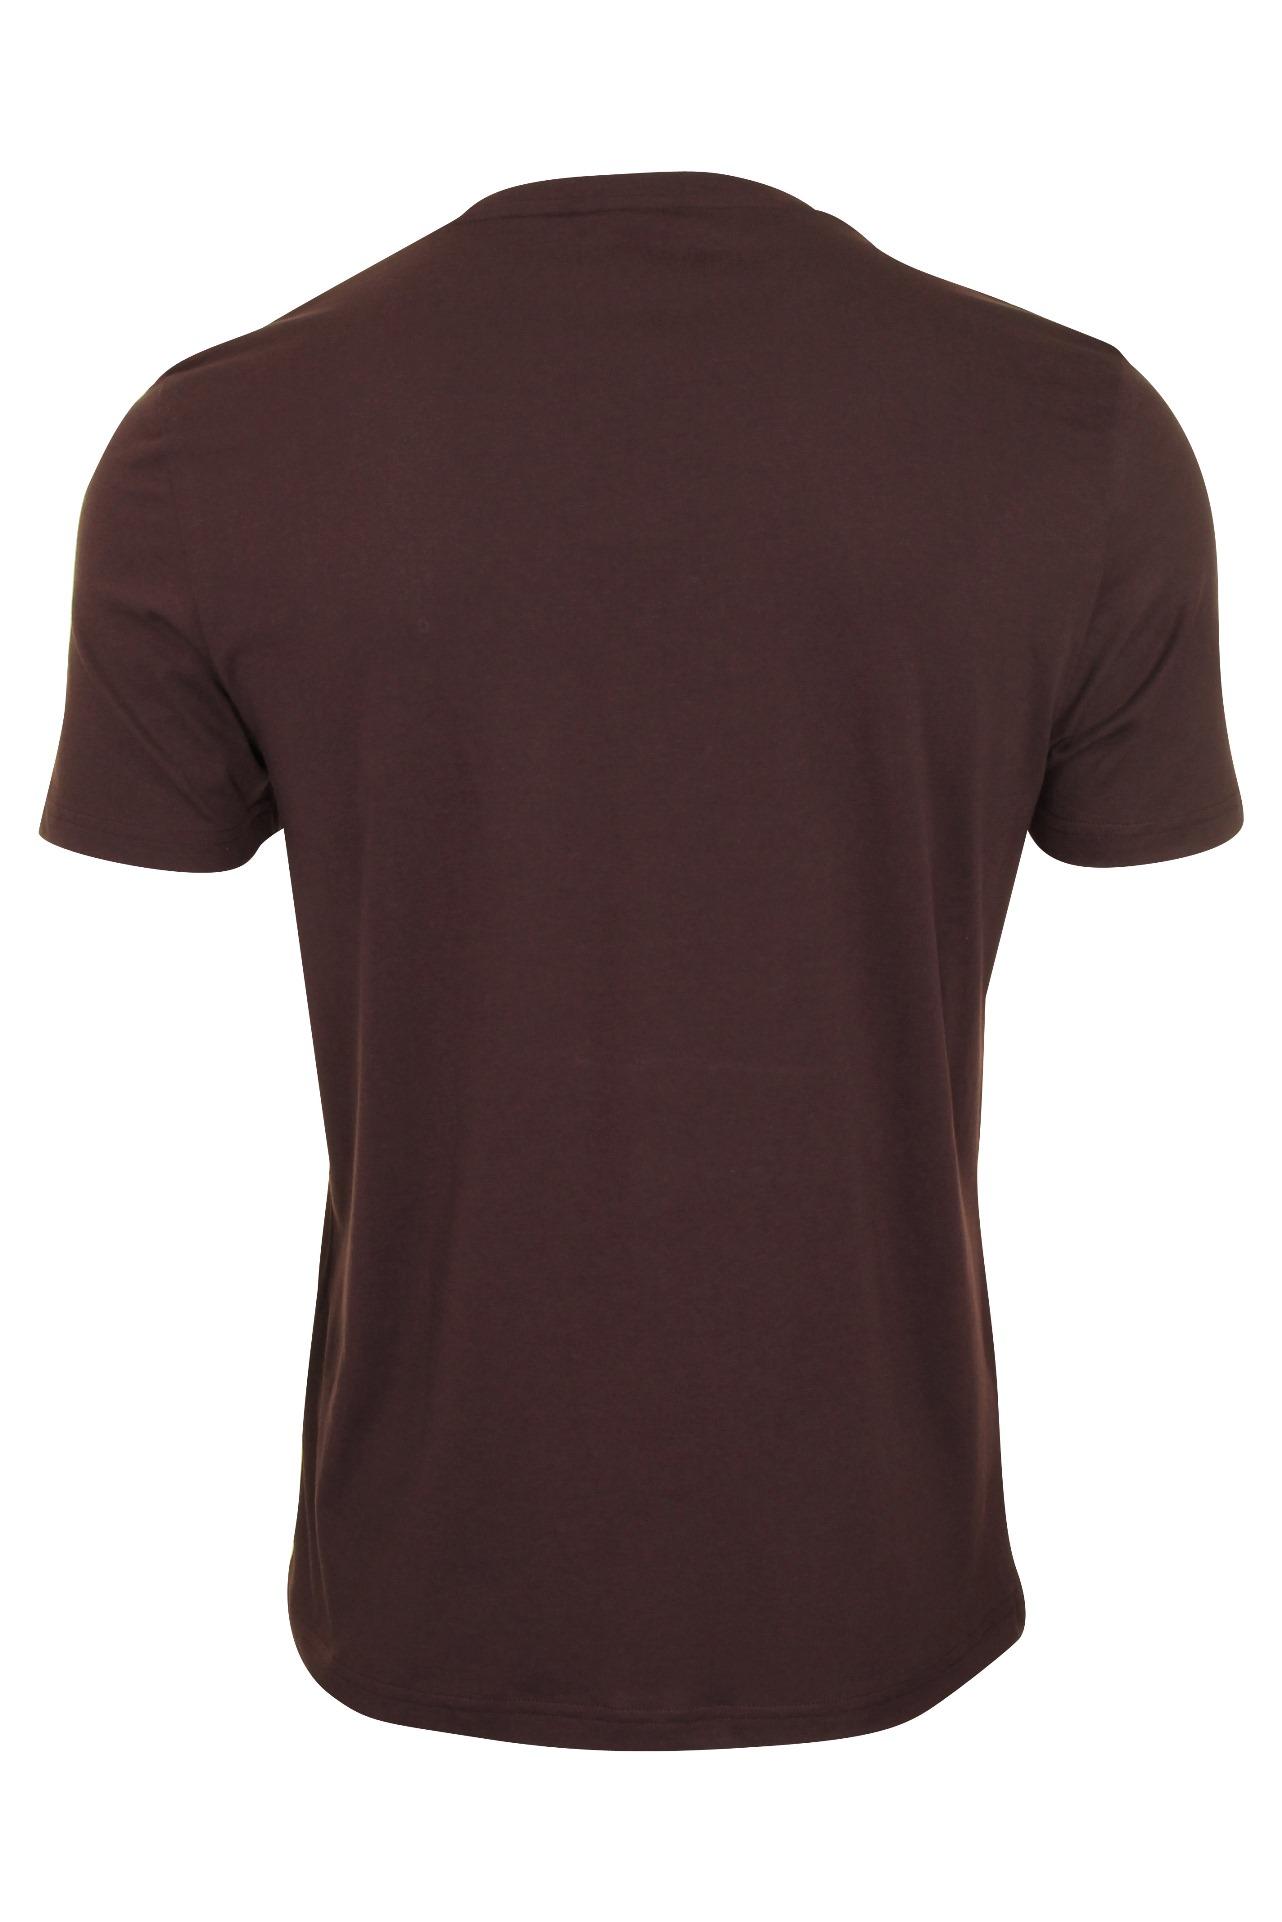 Mens-Classic-Spade-Pocket-T-Shirt-by-Ben-Sherman thumbnail 10